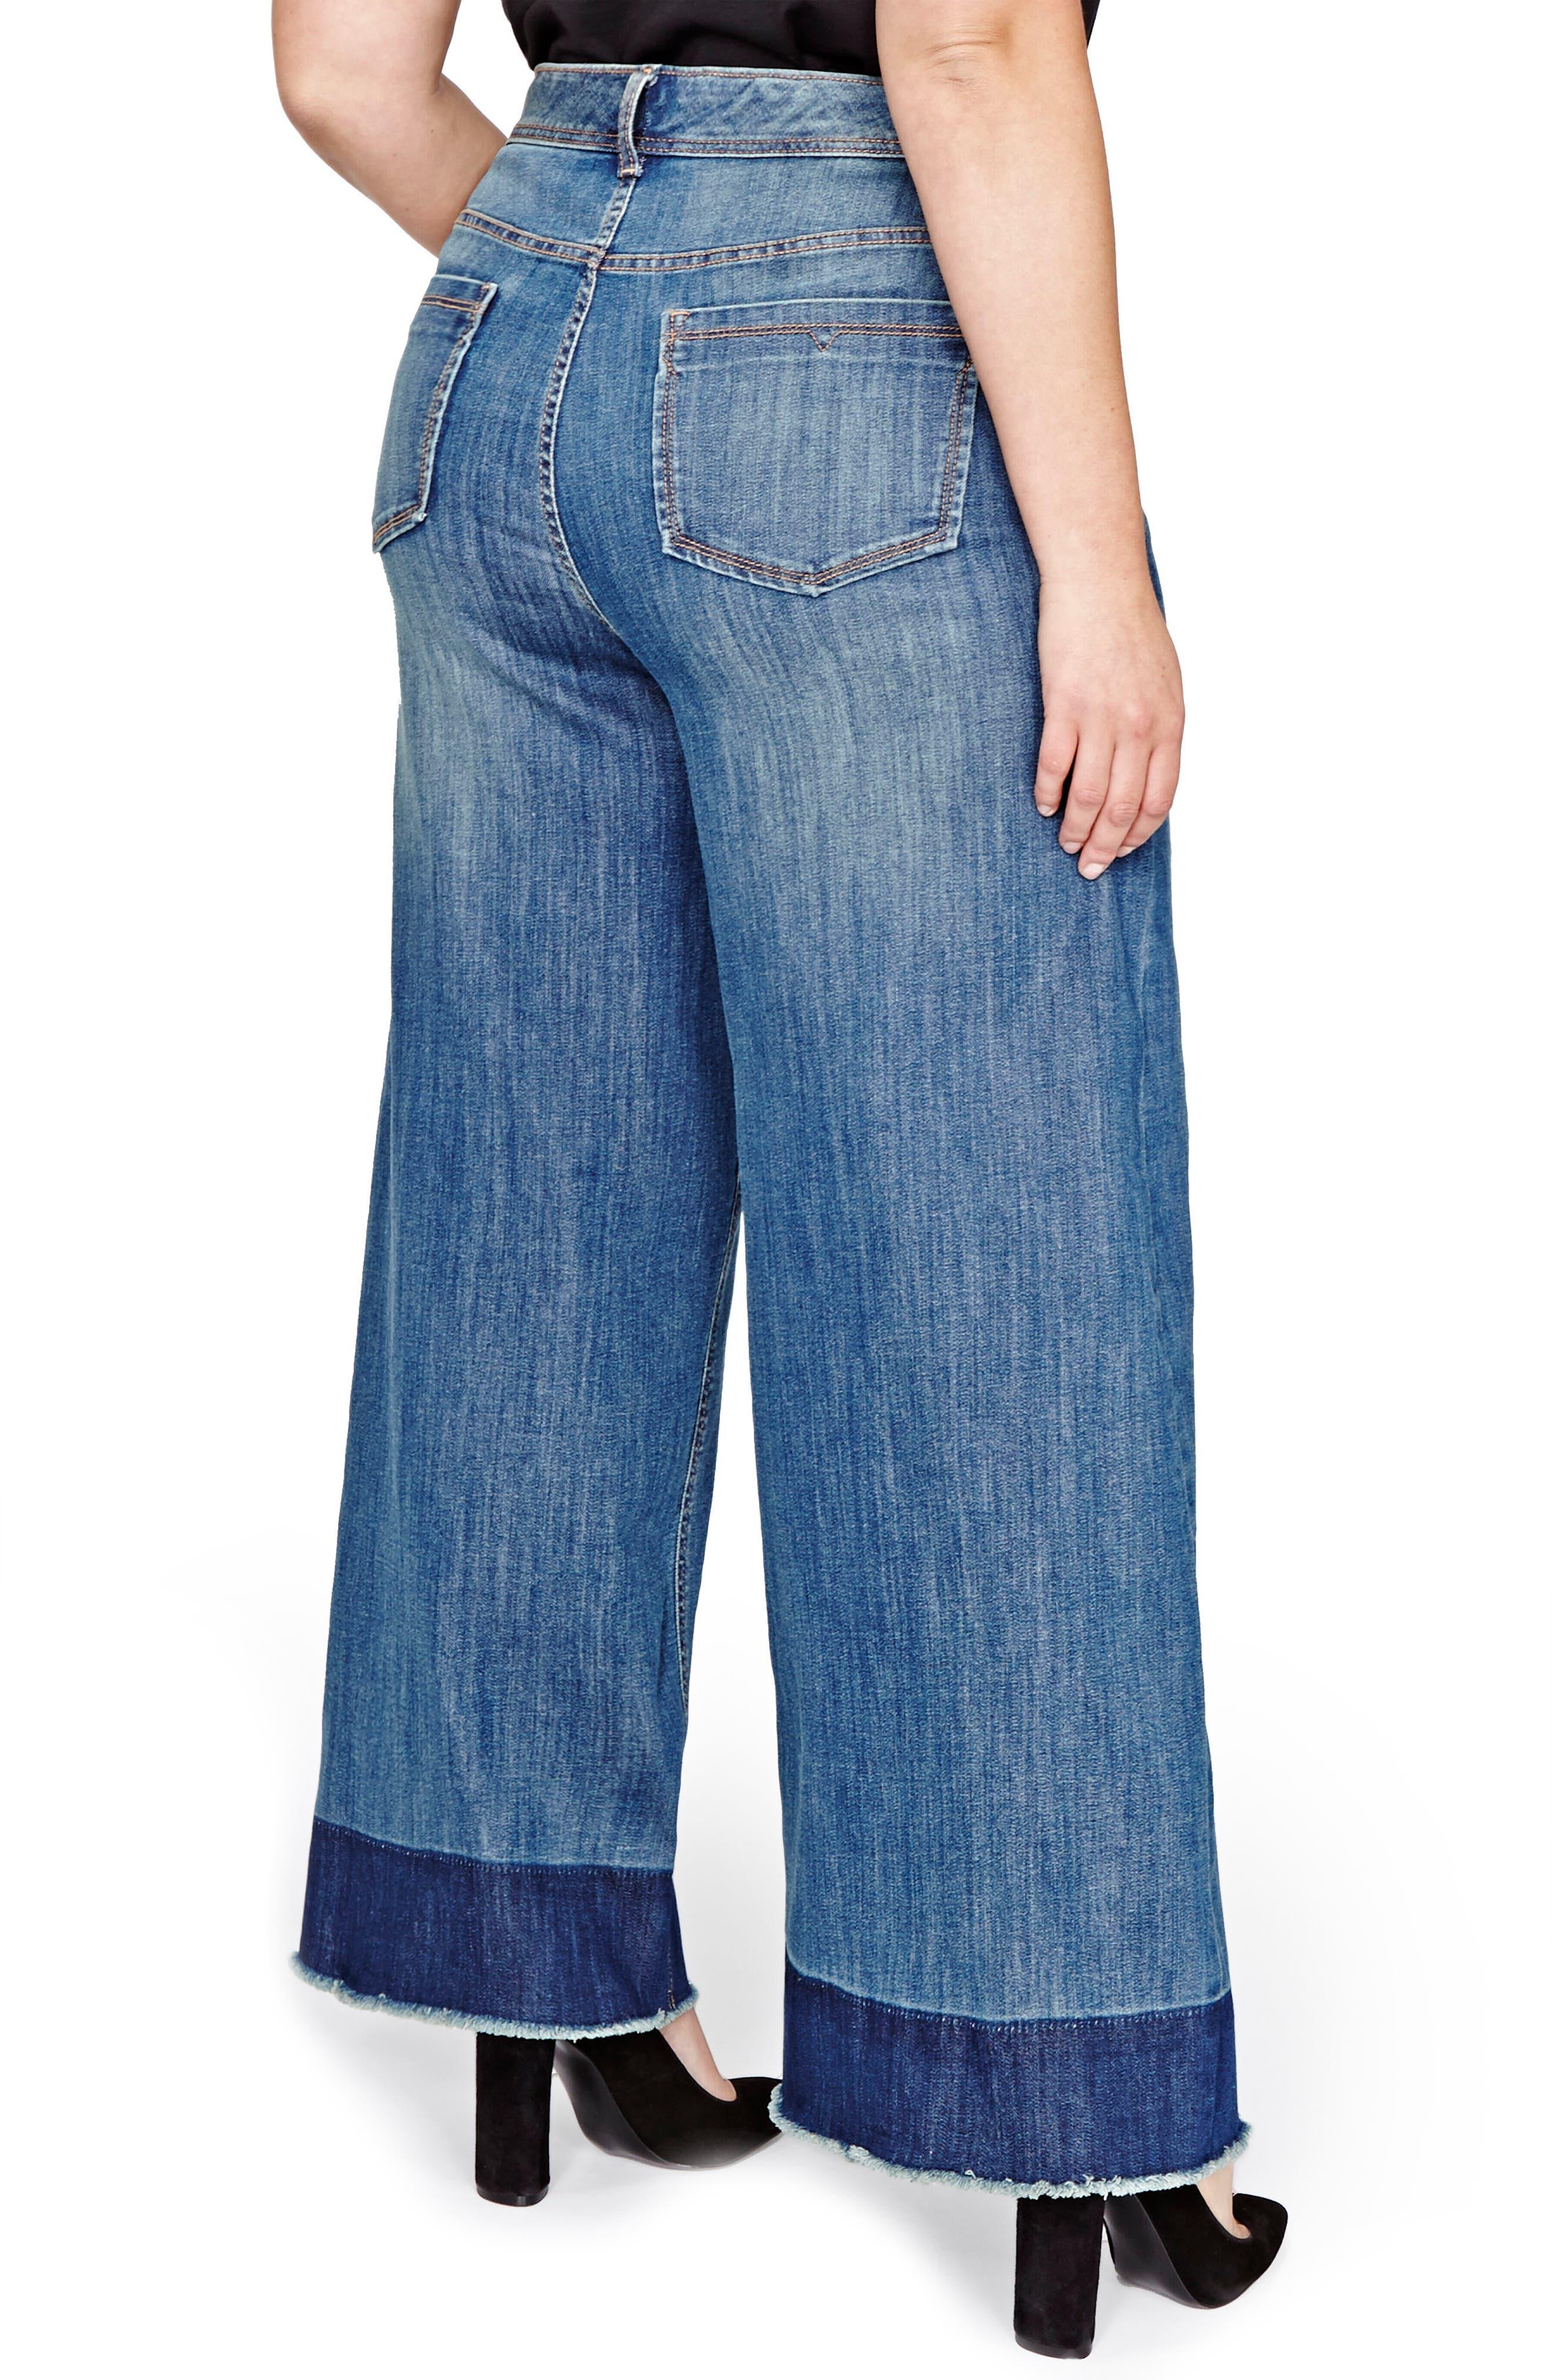 Jordyn Woods High Waist Wide Leg Jeans,                             Alternate thumbnail 2, color,                             Medium Wash Denim